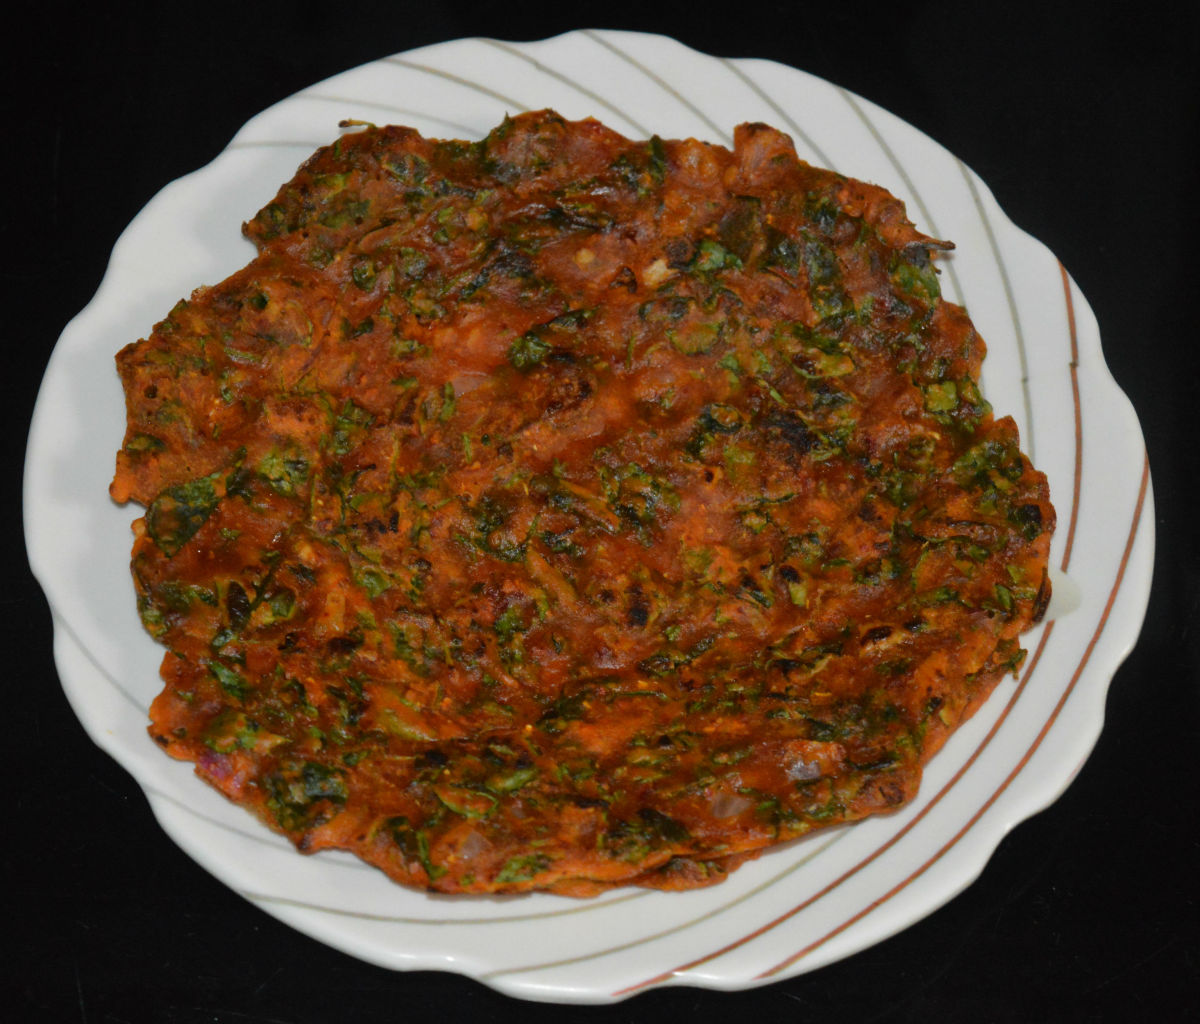 Fenugreek leaf pancakes or methi roti